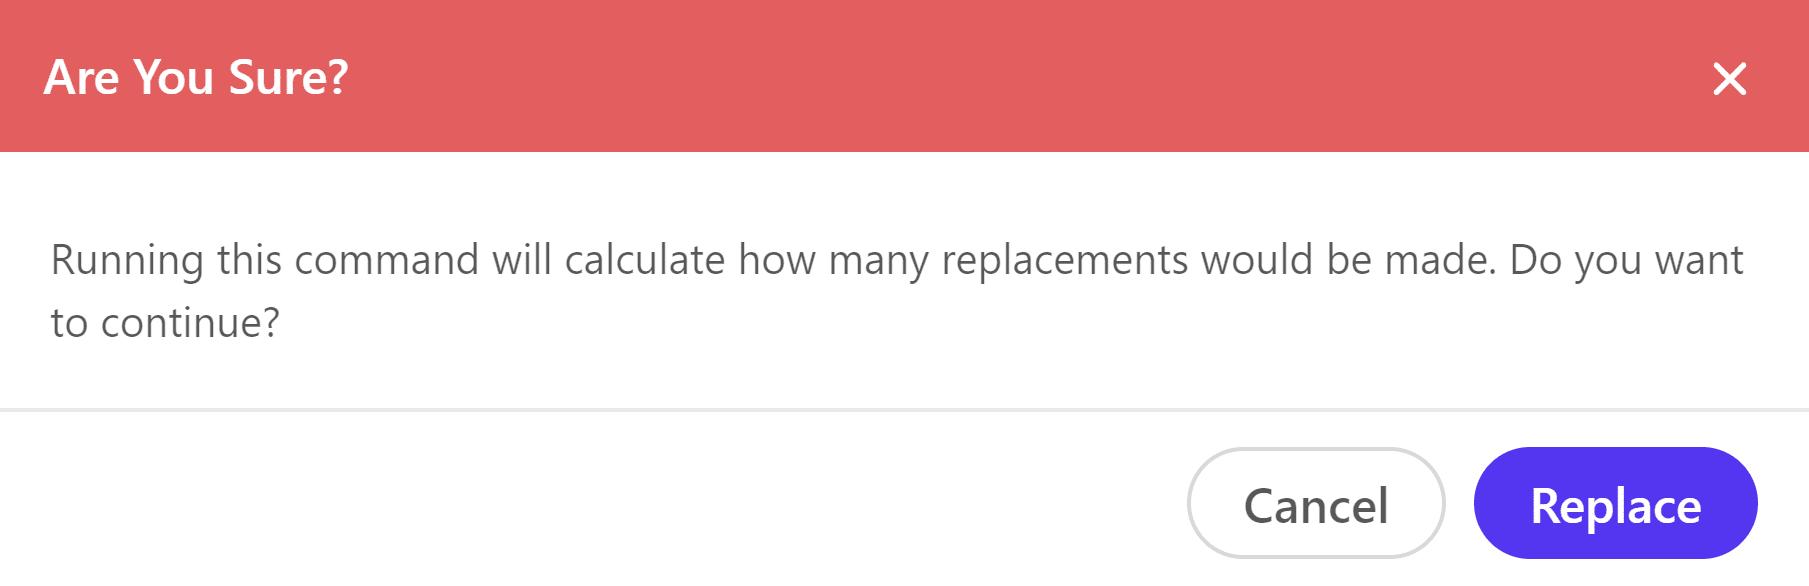 Calcular el número de reemplazos